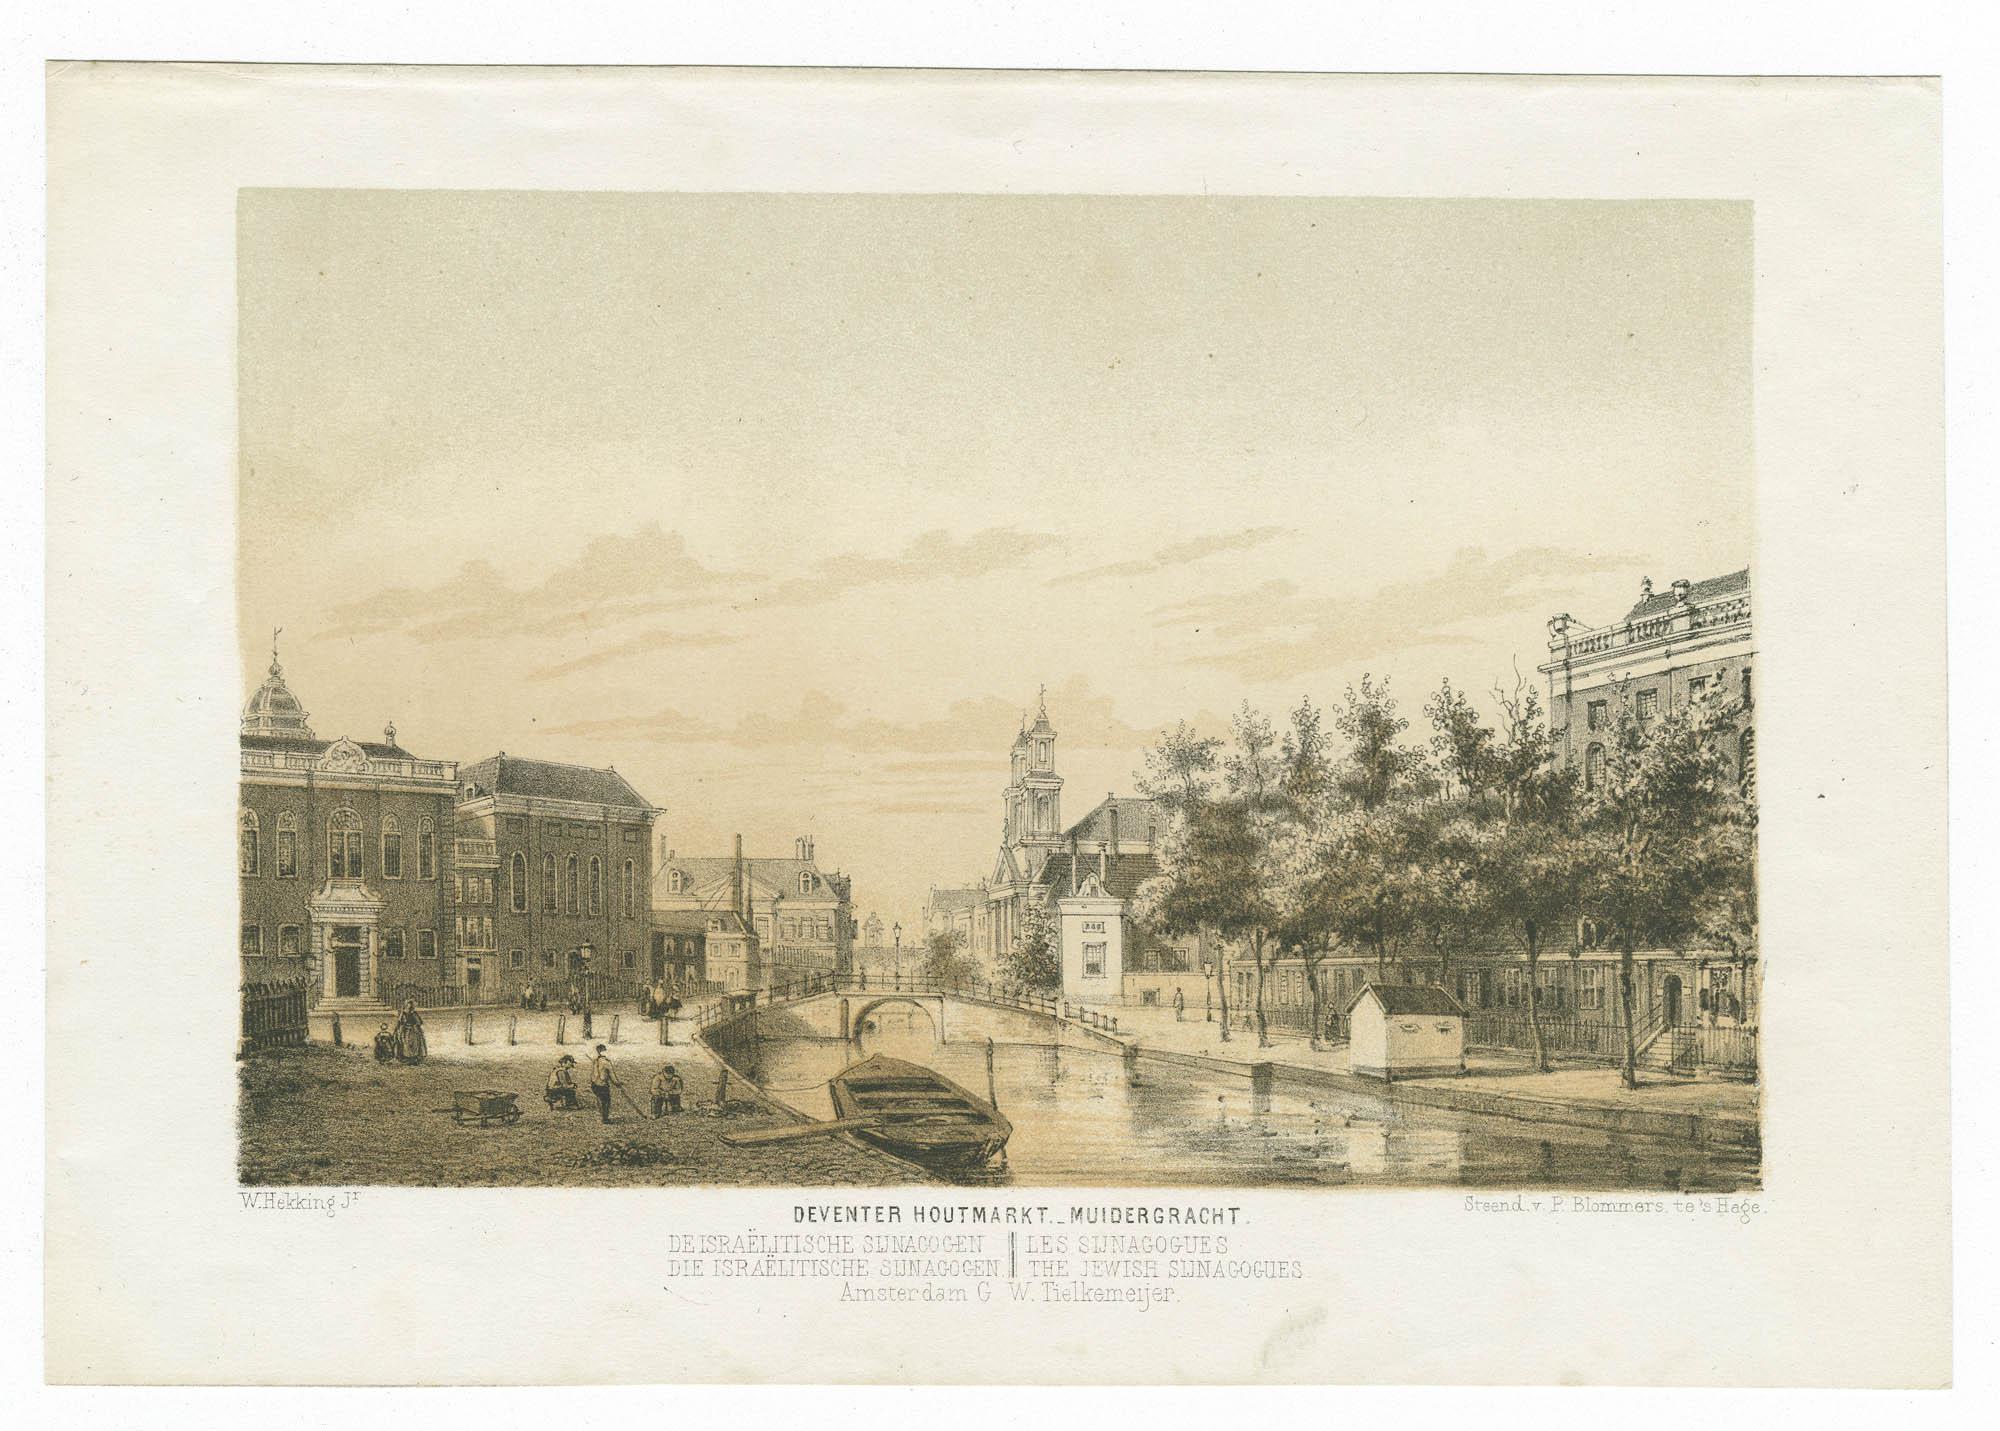 Deventer Houtmarkt. - Muidergracht.